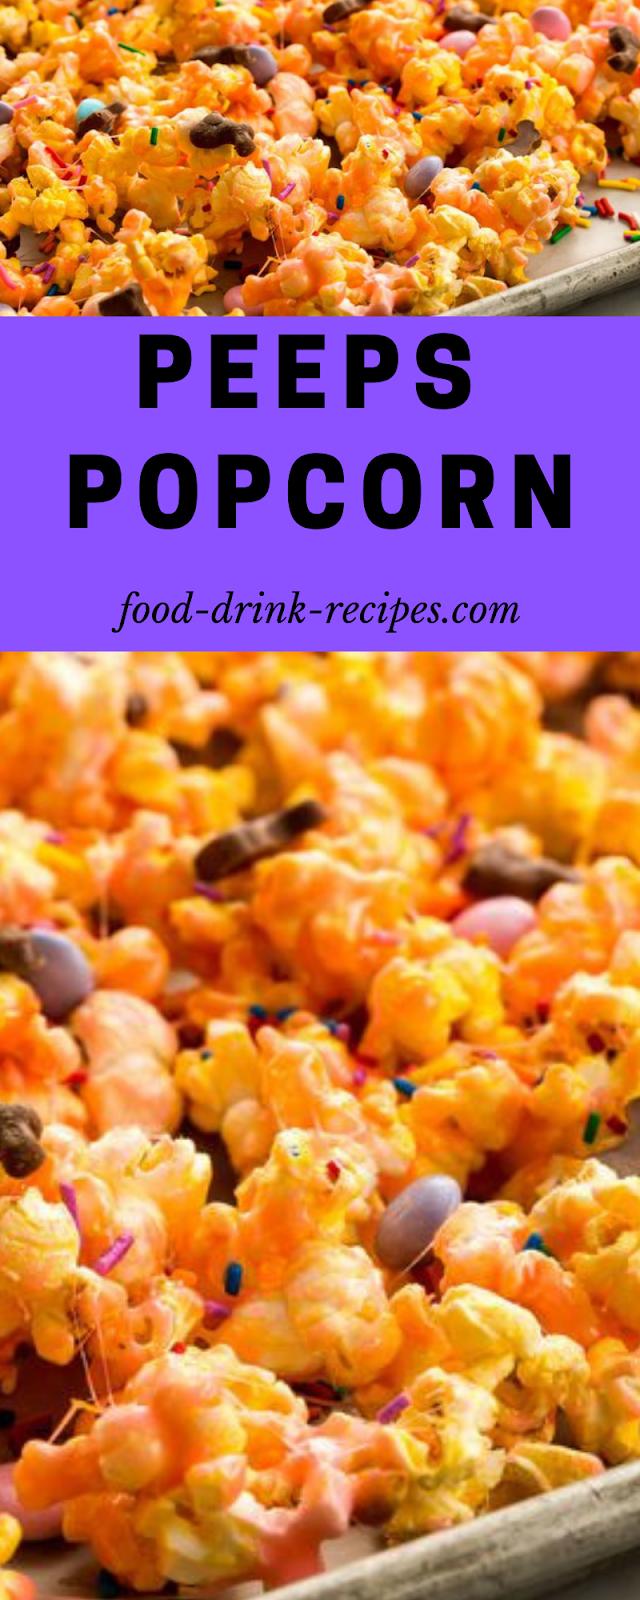 Peeps Popcorn - food-drink-recipes.com